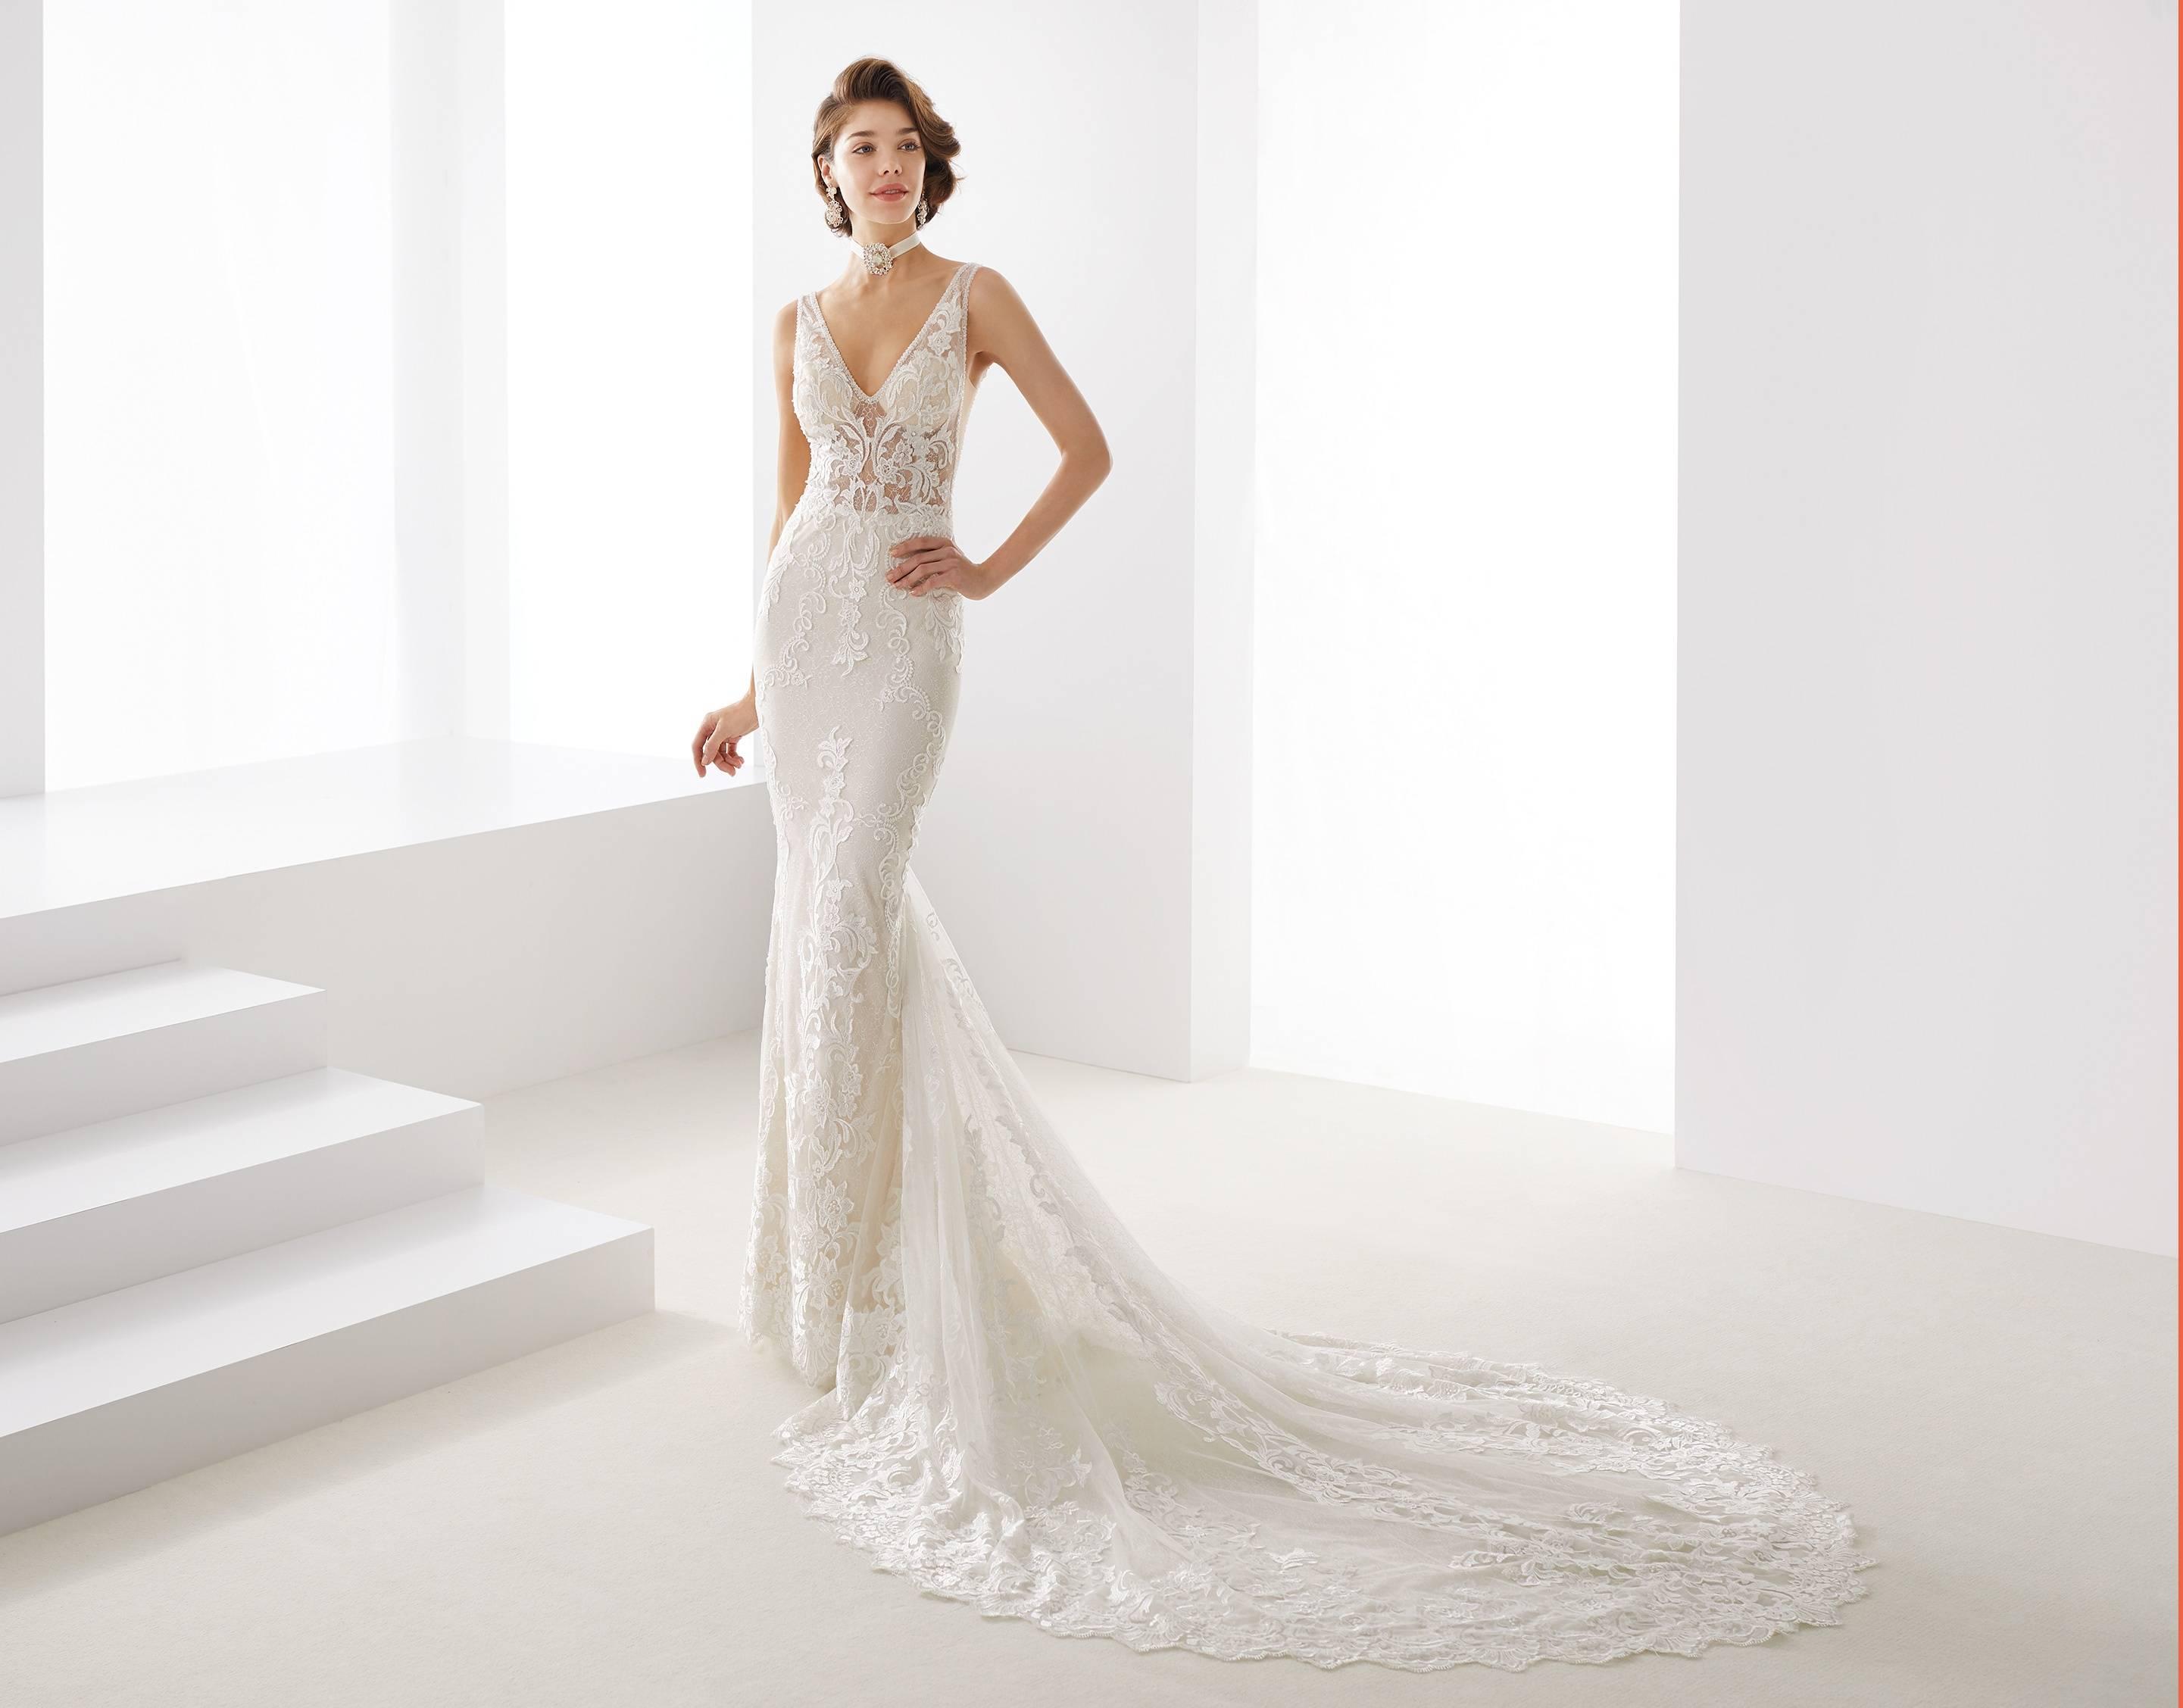 JOAB19407 NICOLE MILANO WEDDING DRESS